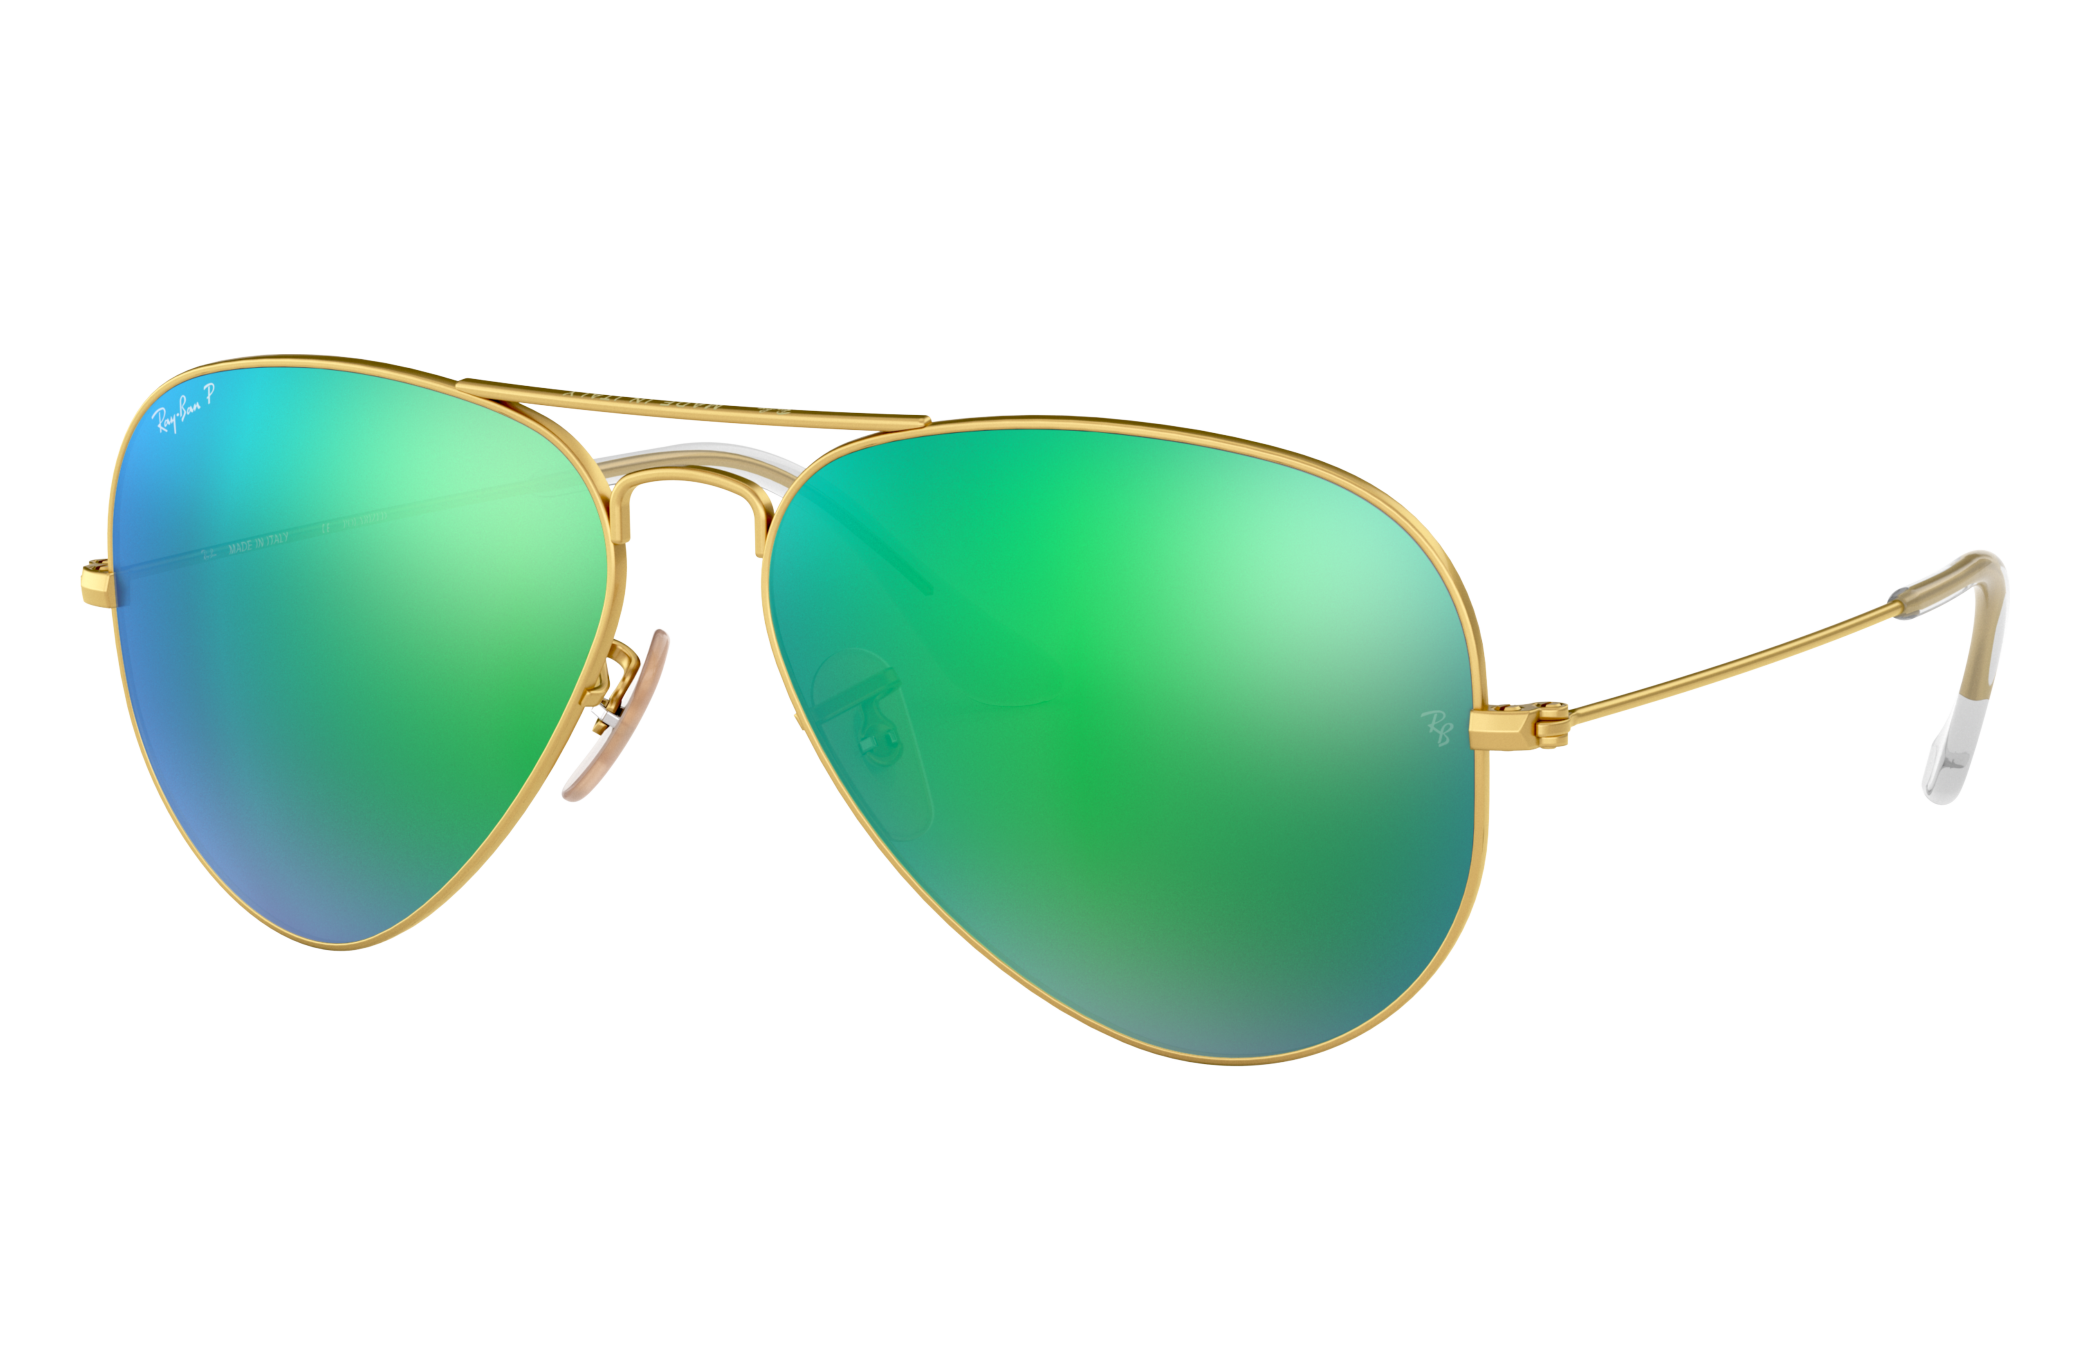 Ray-Ban Aviator Flash Lenses Gold, Polarized Green Lenses - RB3025